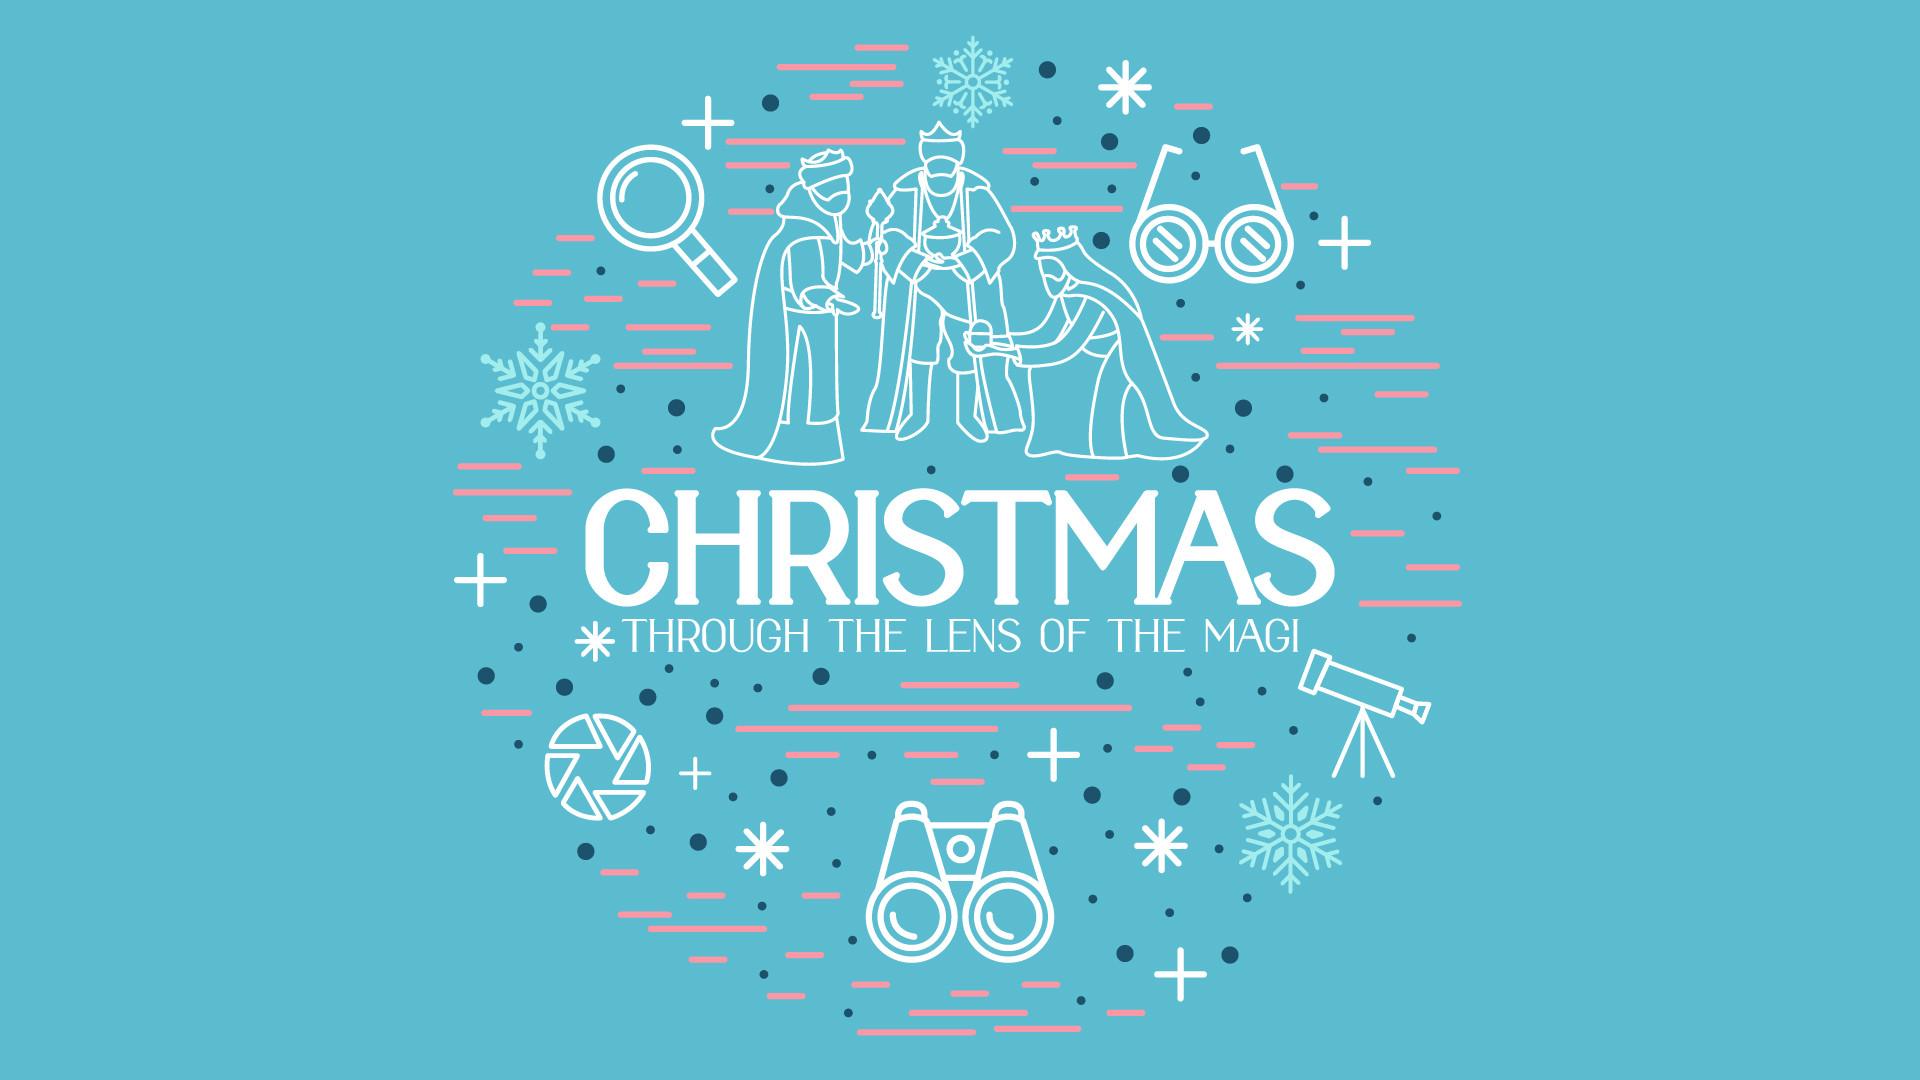 Christmas Through the Lens of the Magi